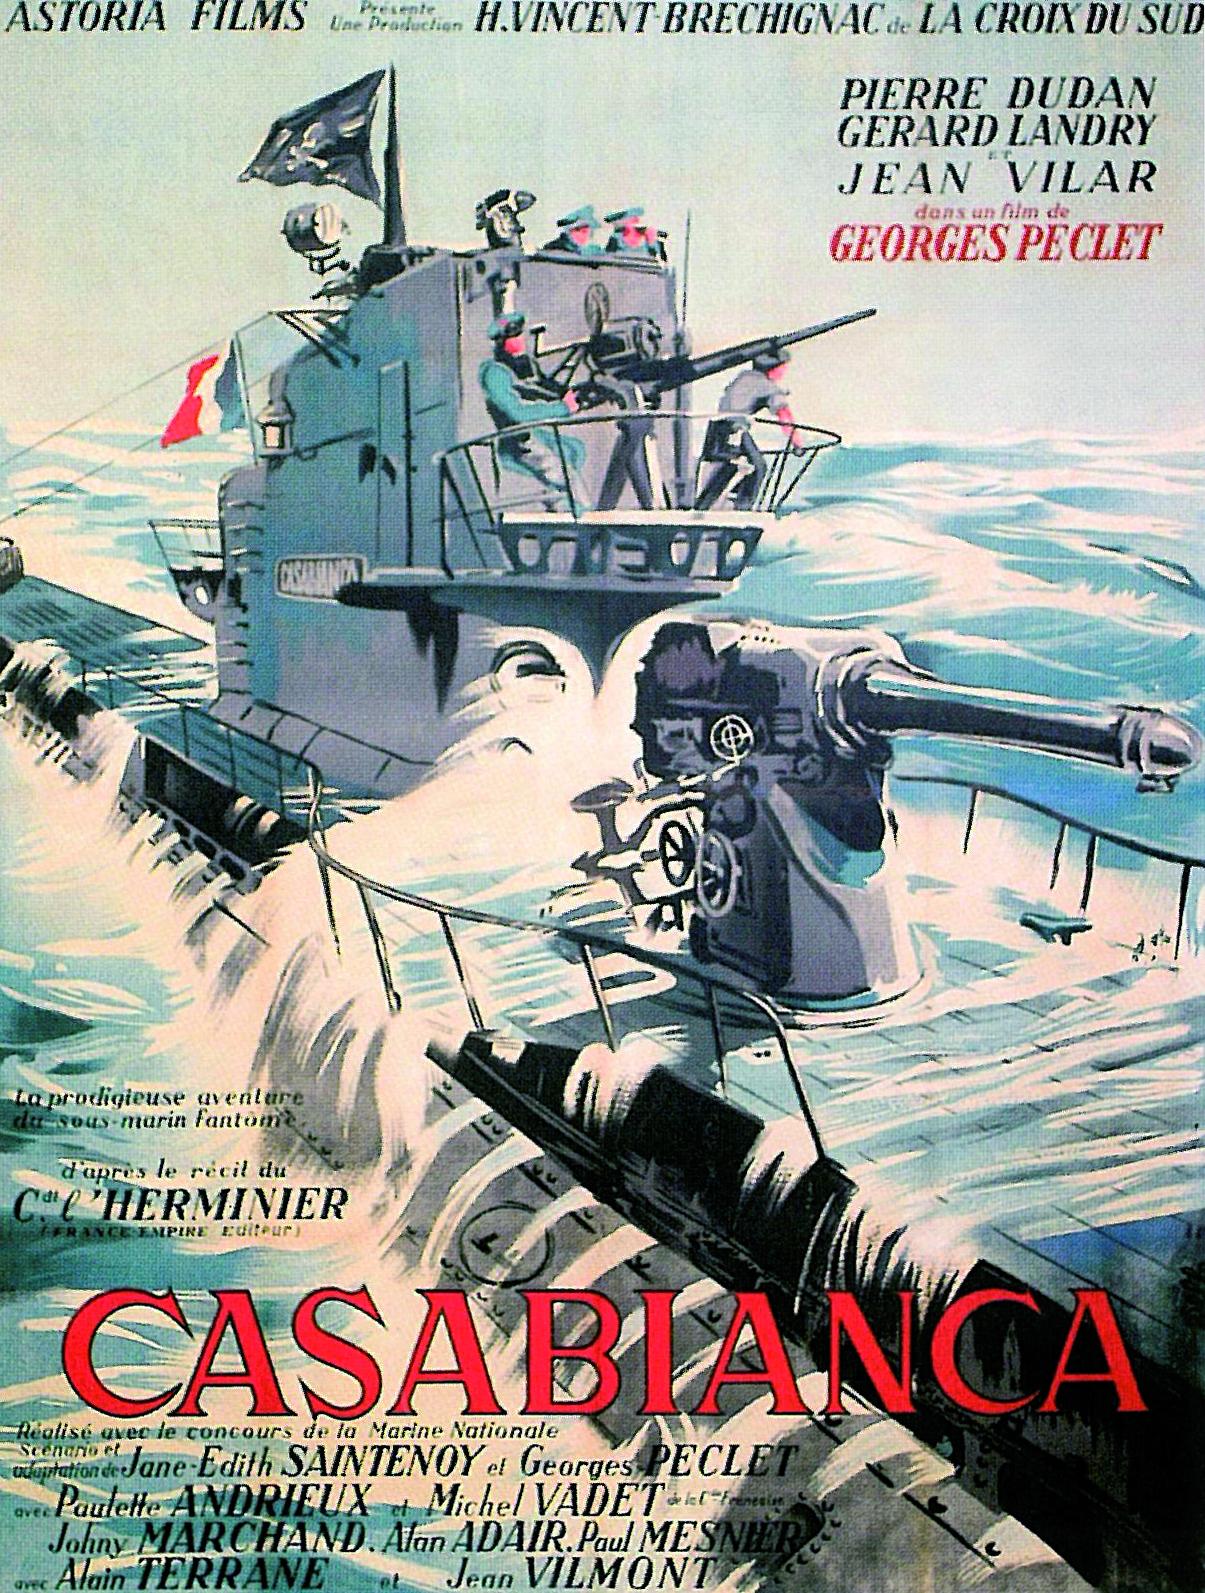 Casabianca